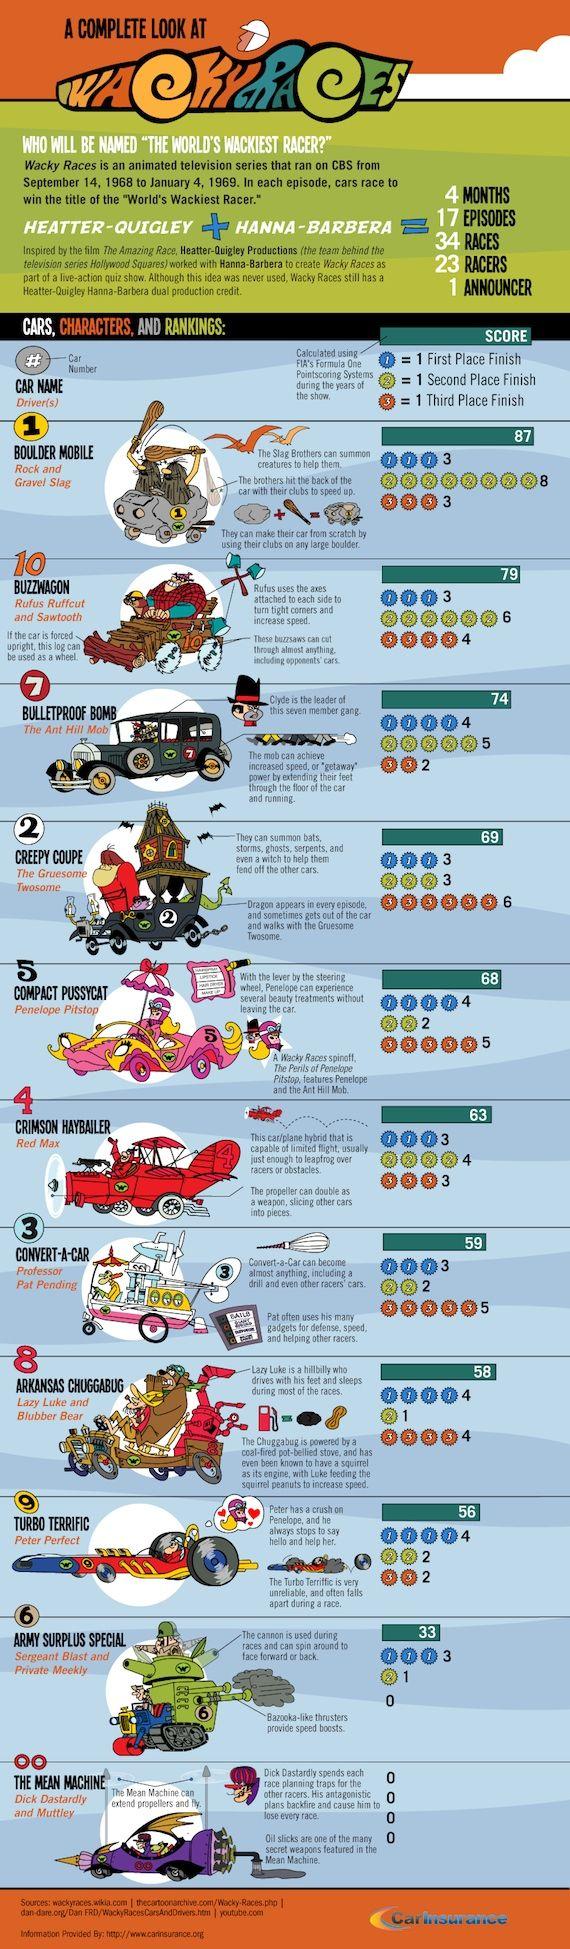 #Wacky_Races... Loved the comics and the cartoon!